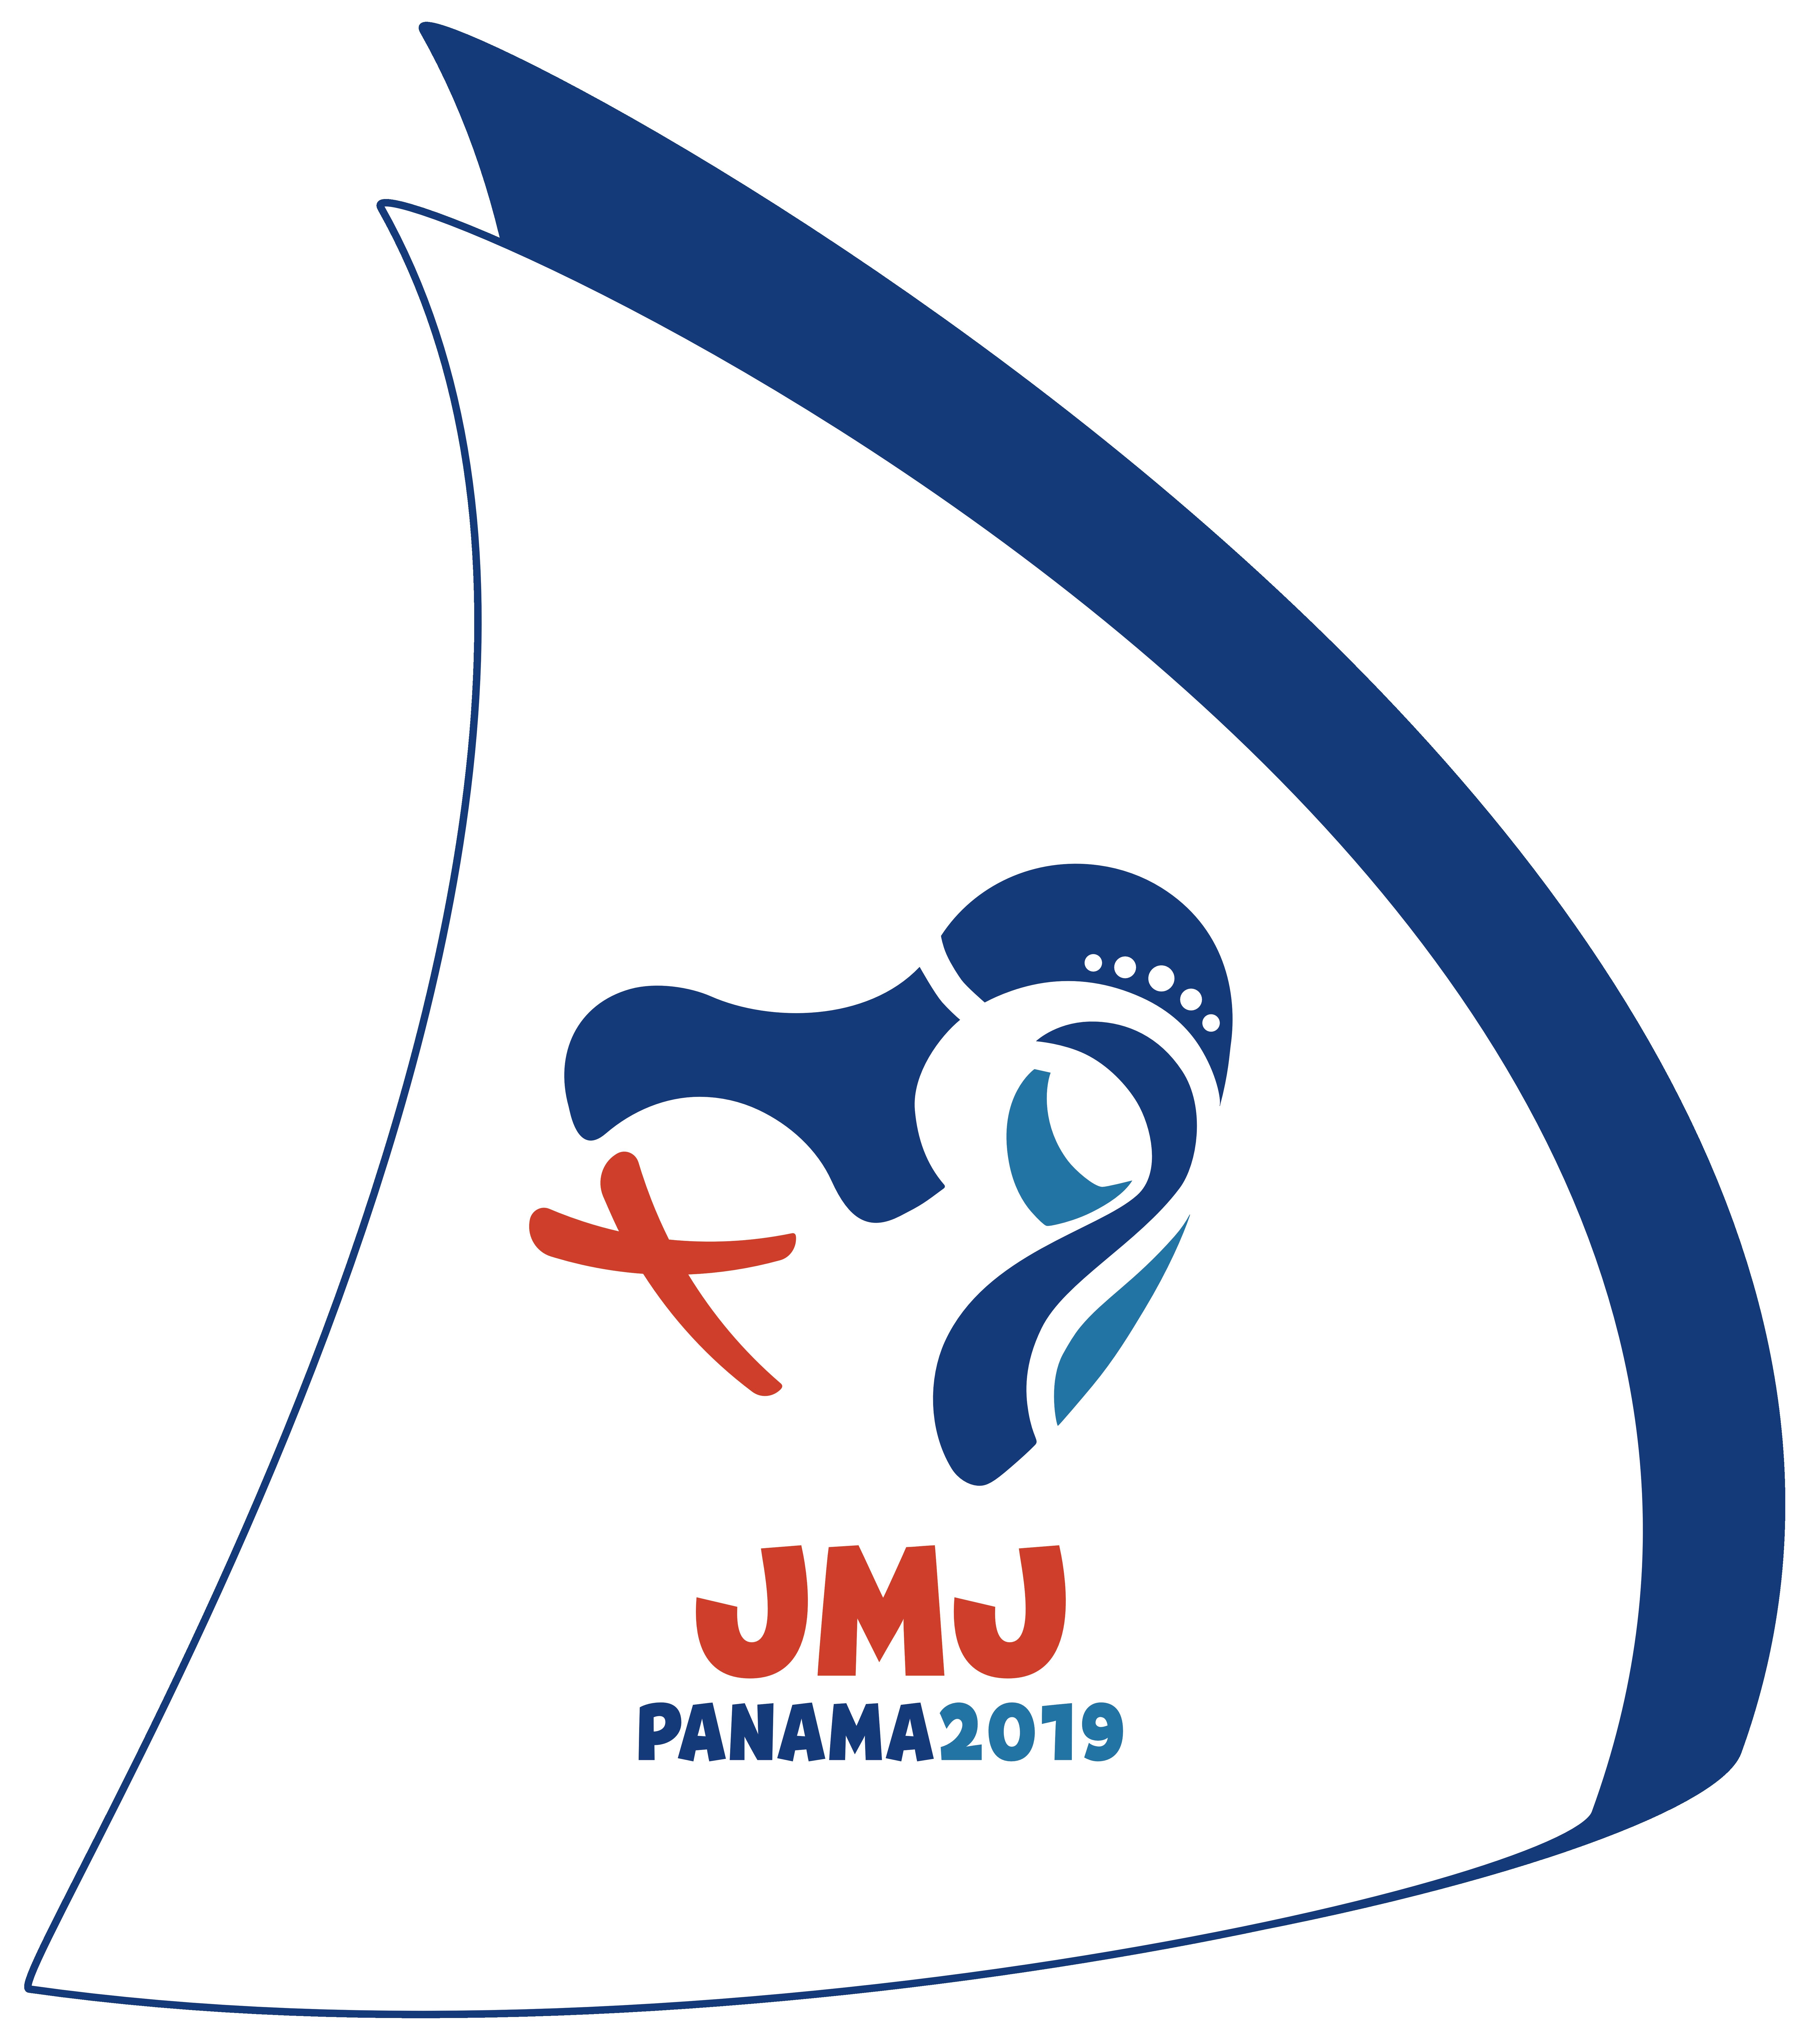 image_thumb_JMJ 2019 – CAP SUR PANAMA !